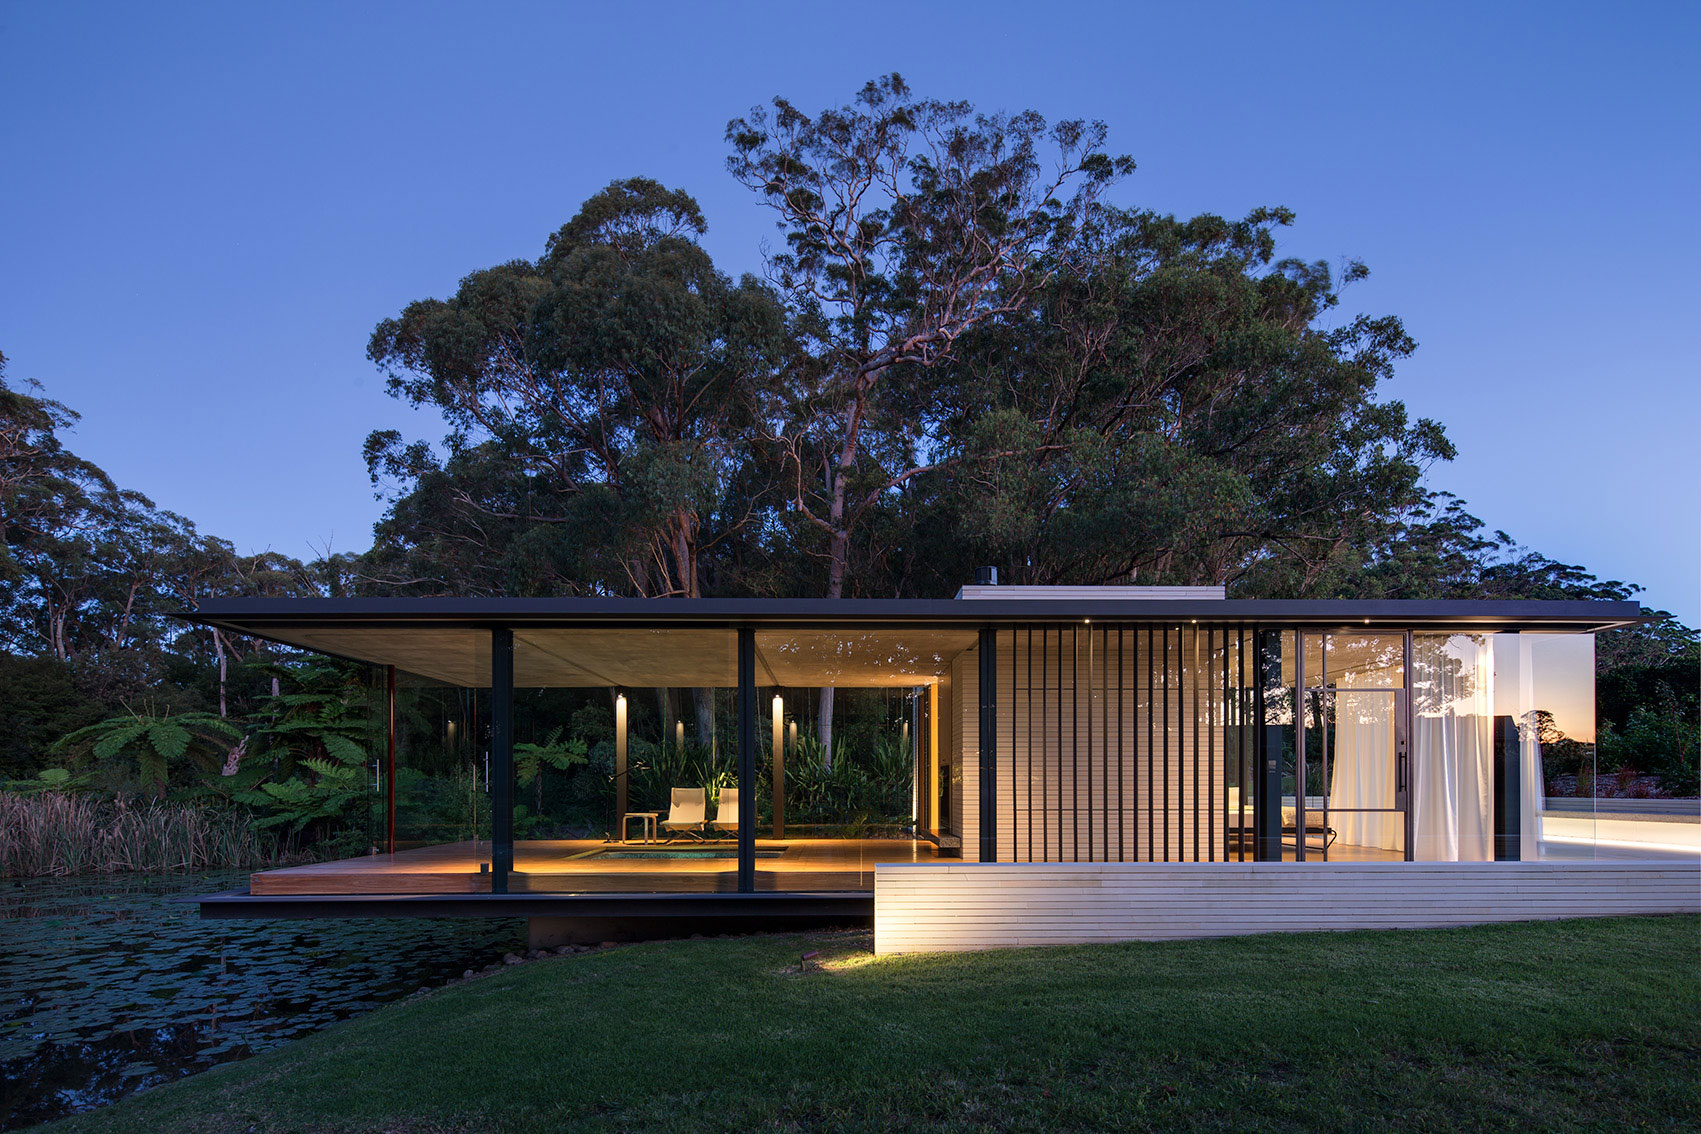 Wirra willa pavilion matthew woodward architecture for Pavilion style home designs